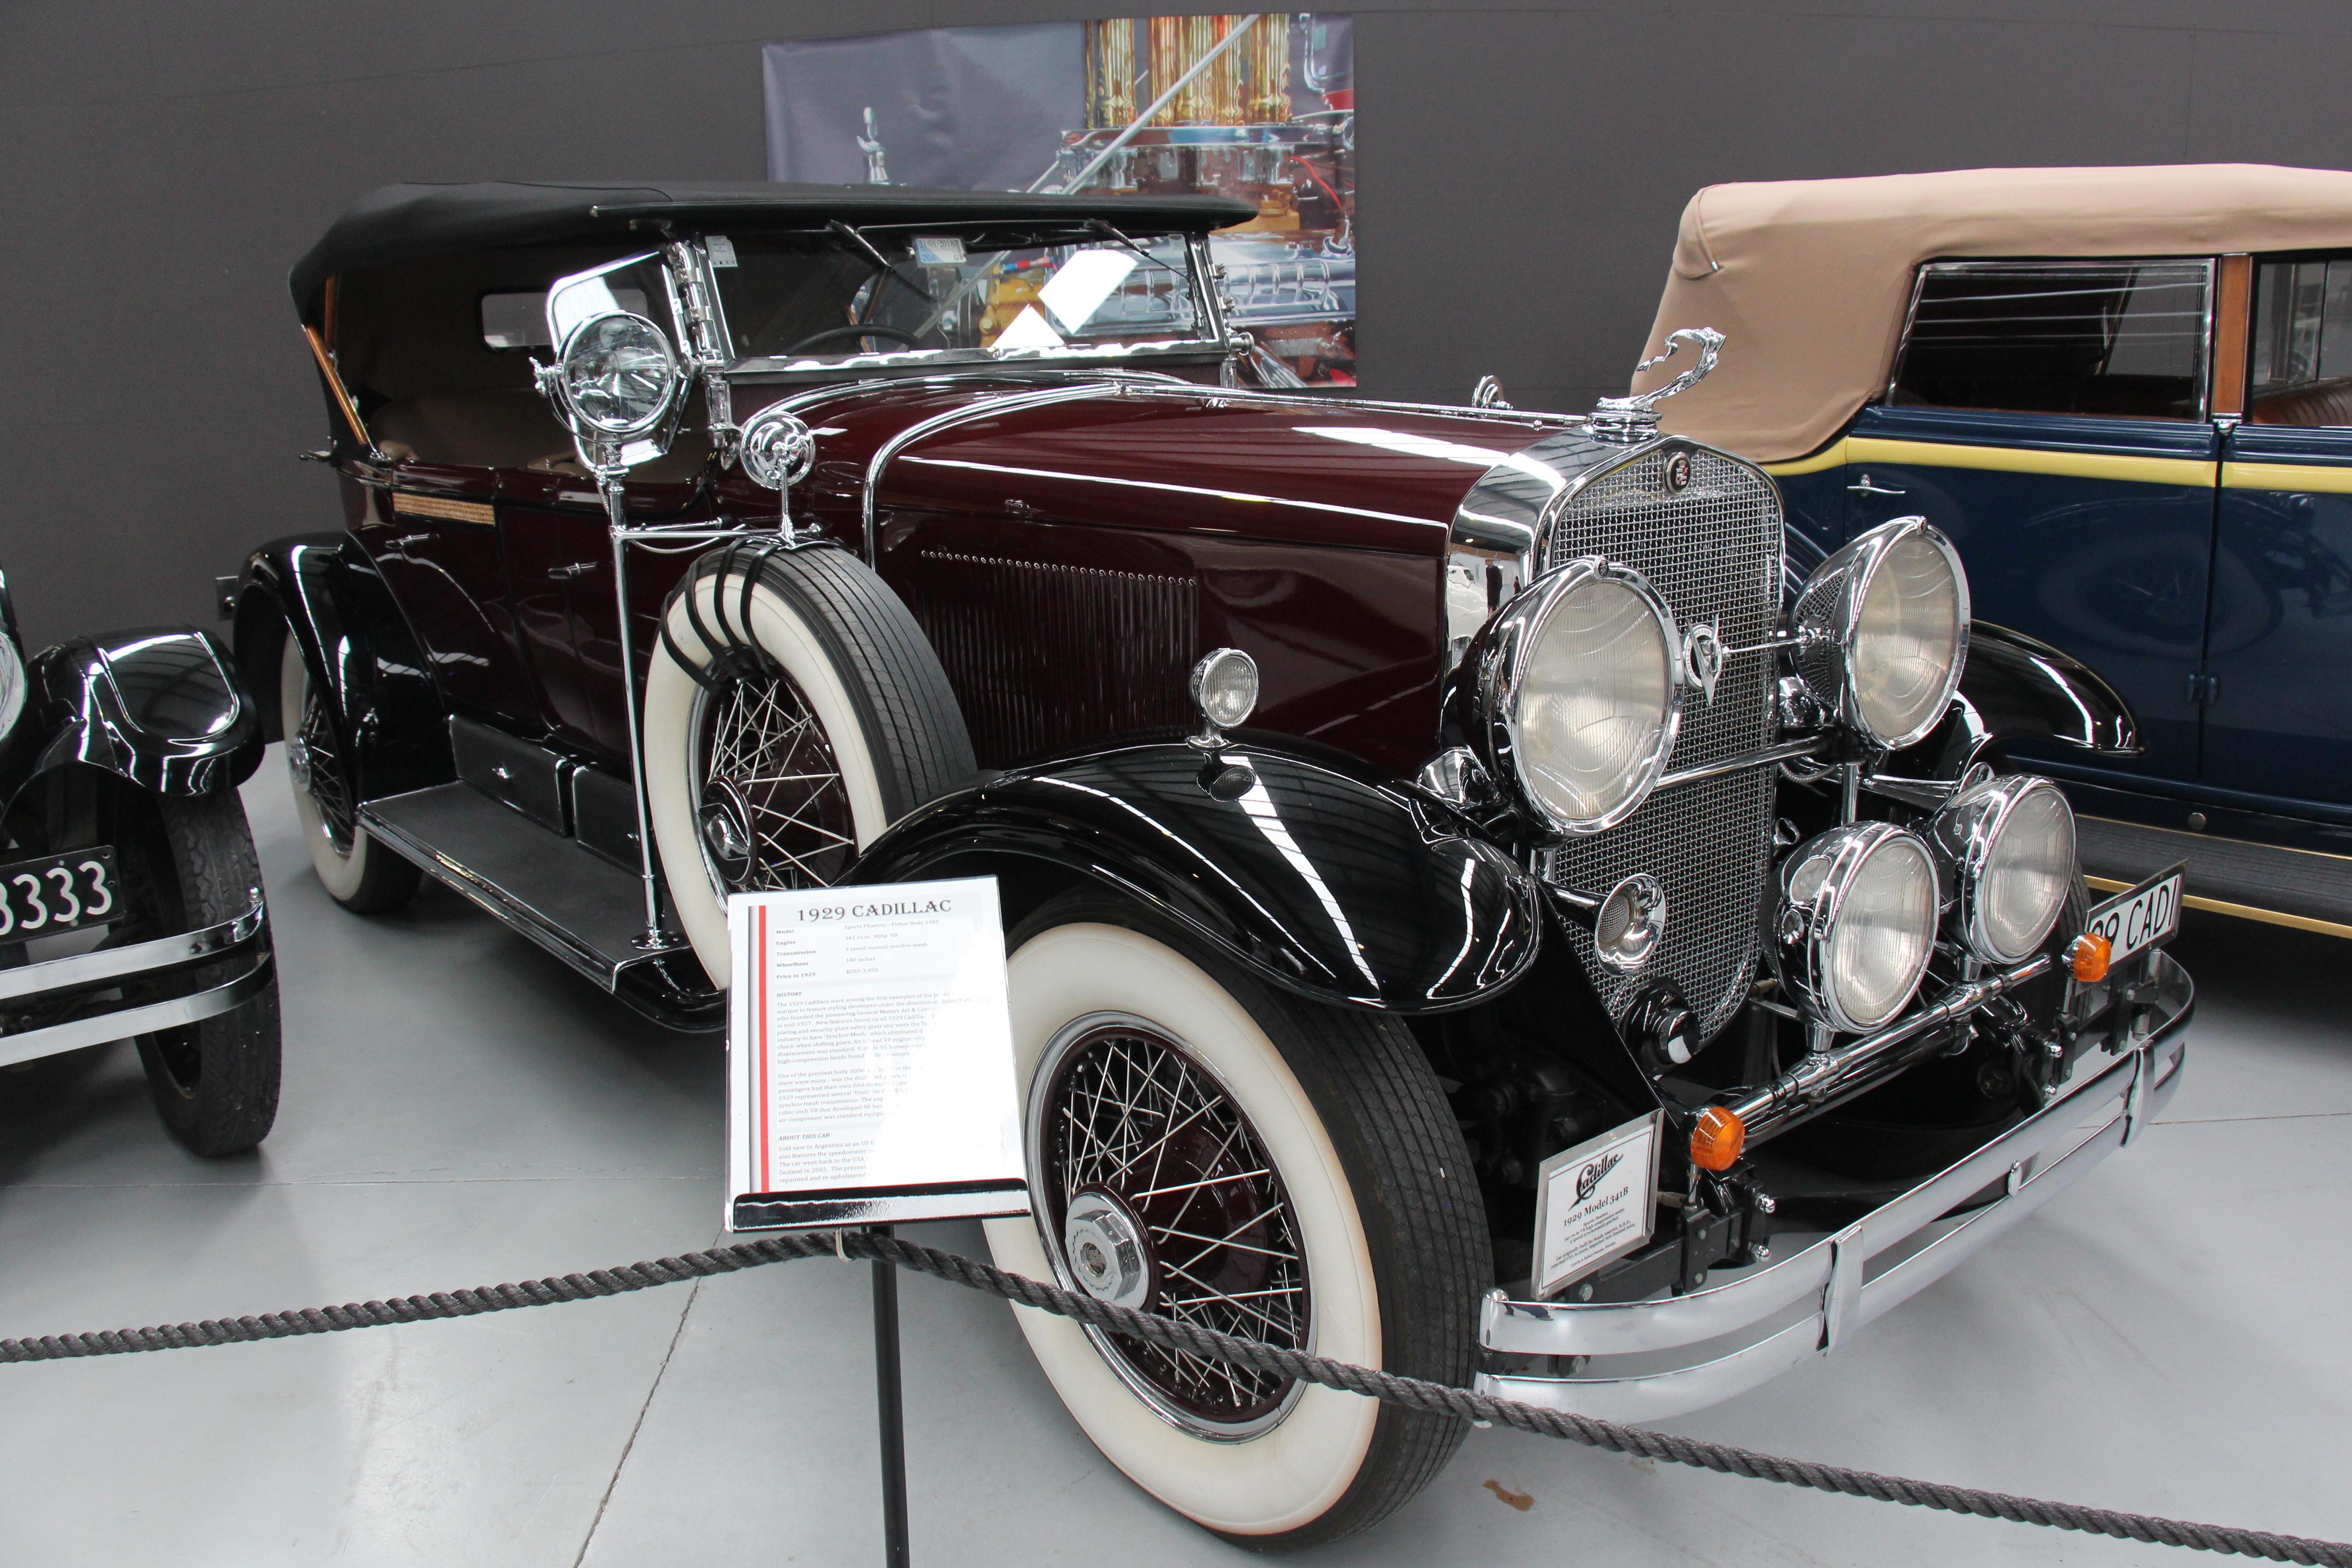 File:1929 Cadillac 341-B Sport Phaeton (32956822105).jpg - Wikimedia